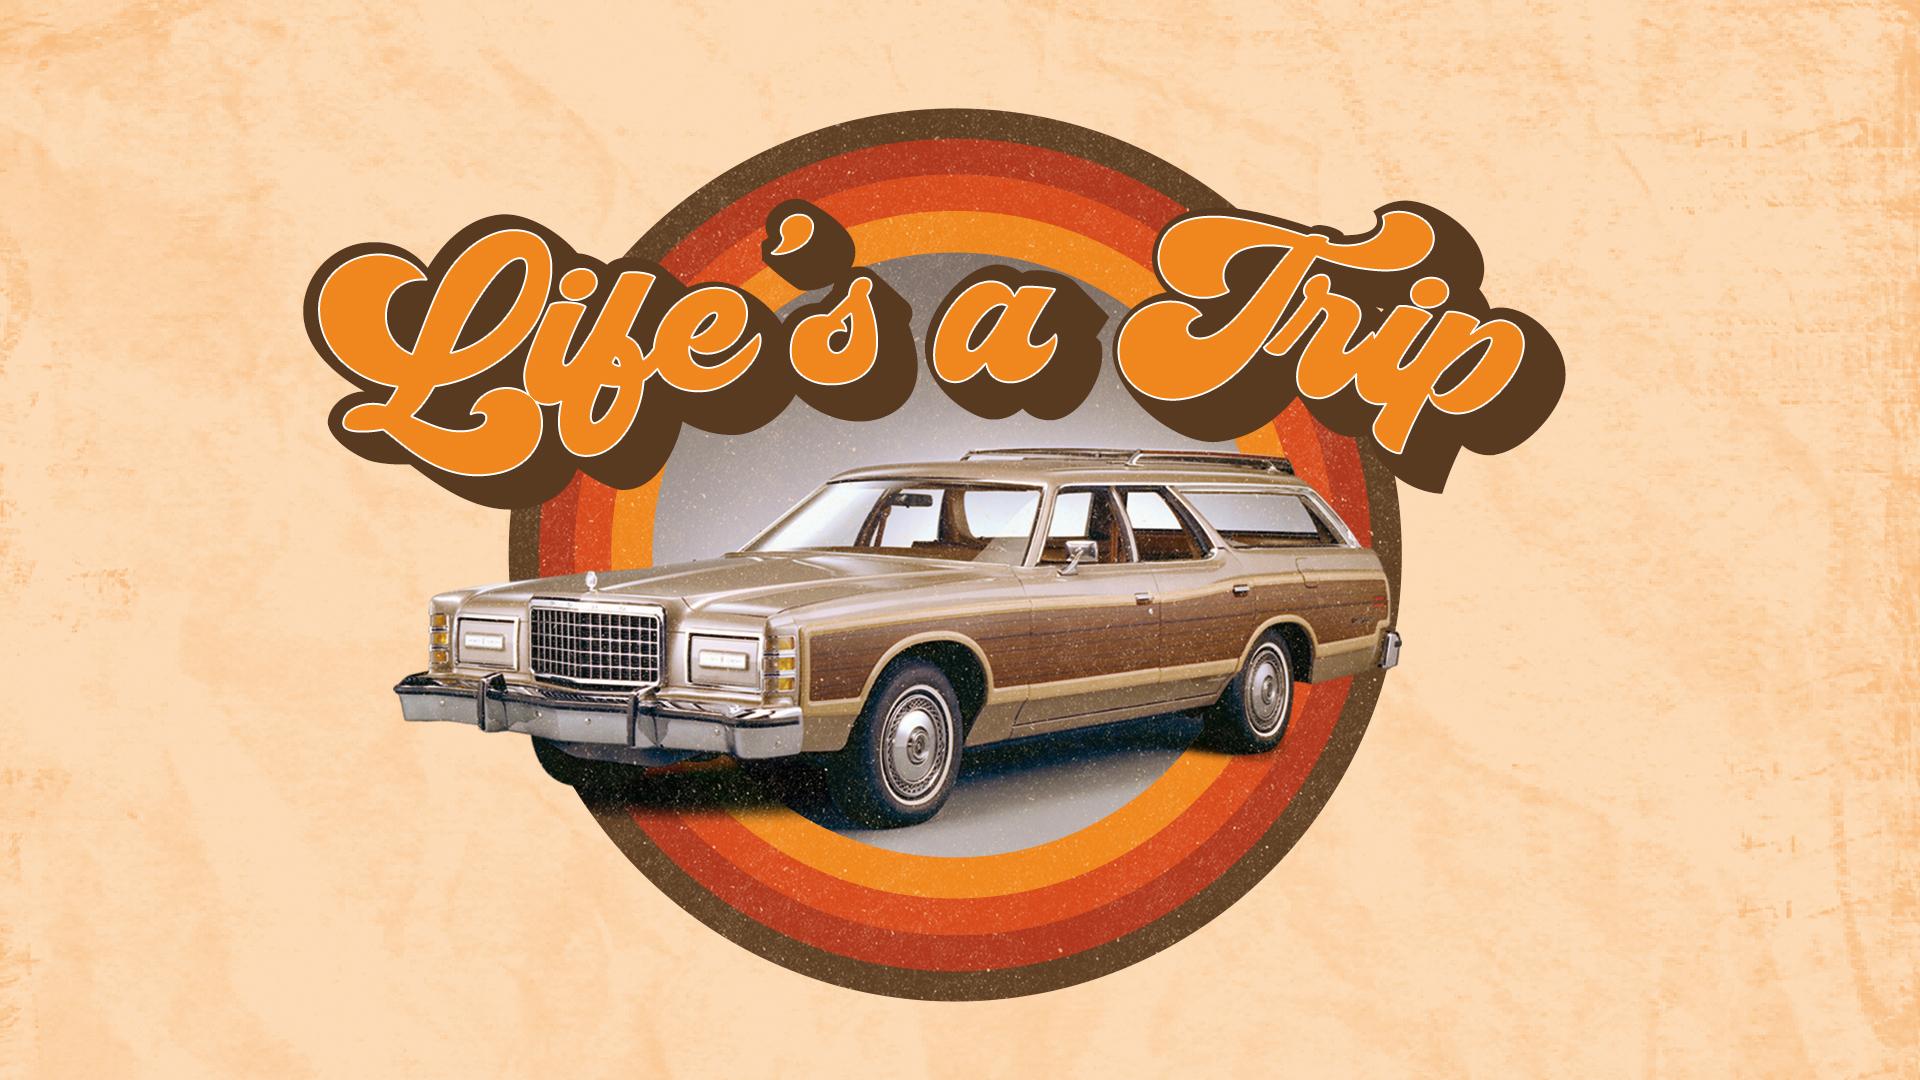 series-life-is-a-trip.jpg